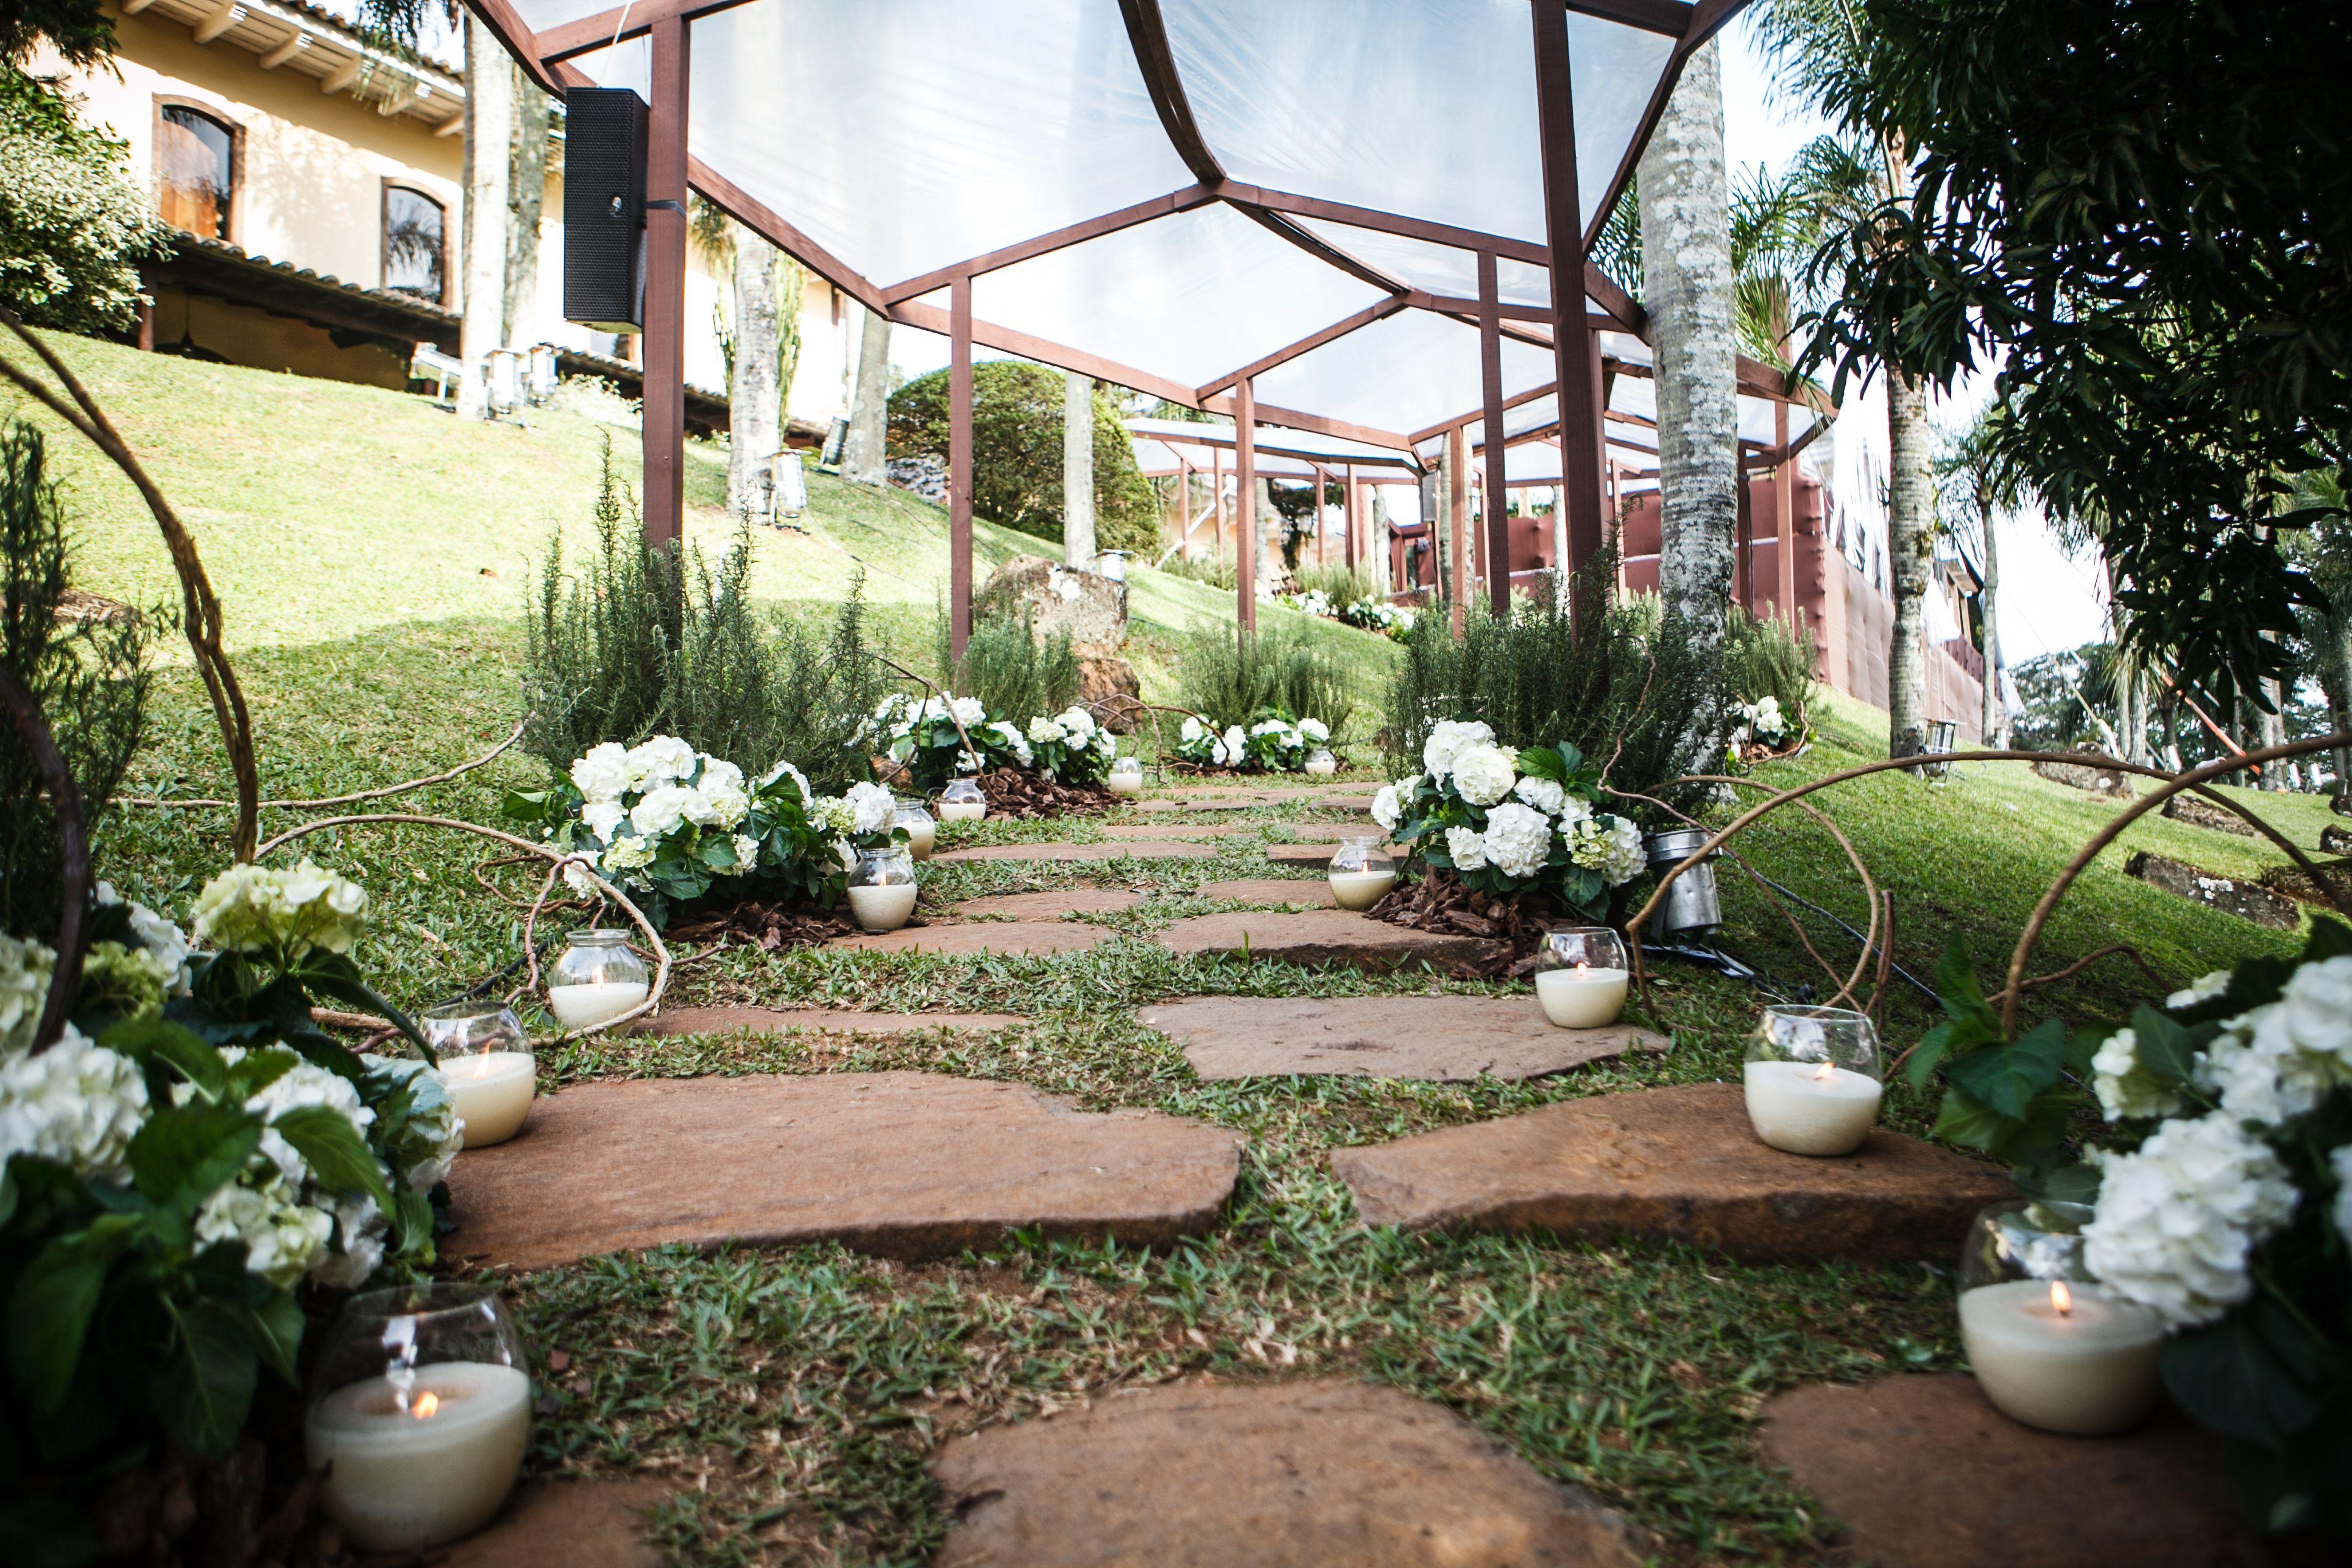 Inesquecvel casamento casamento wedding casamento ao ar livre inesquecvel casamento casamento wedding casamento ao ar livre outside wedding outside junglespirit Gallery